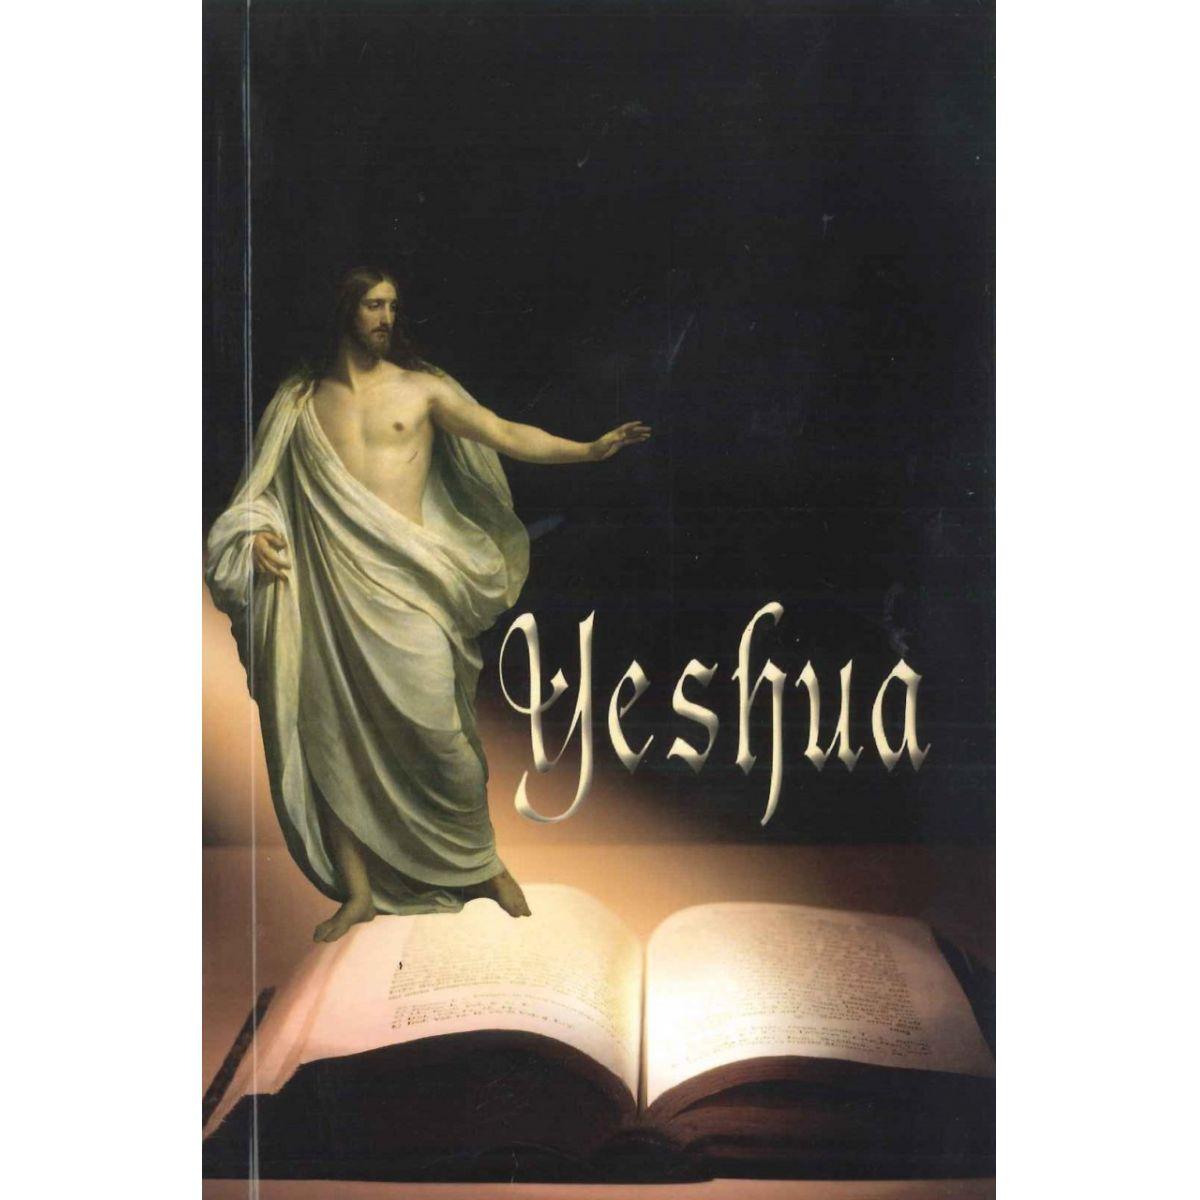 Autores: Raymundo Lopes  Editora: Magnificat  Yeshua